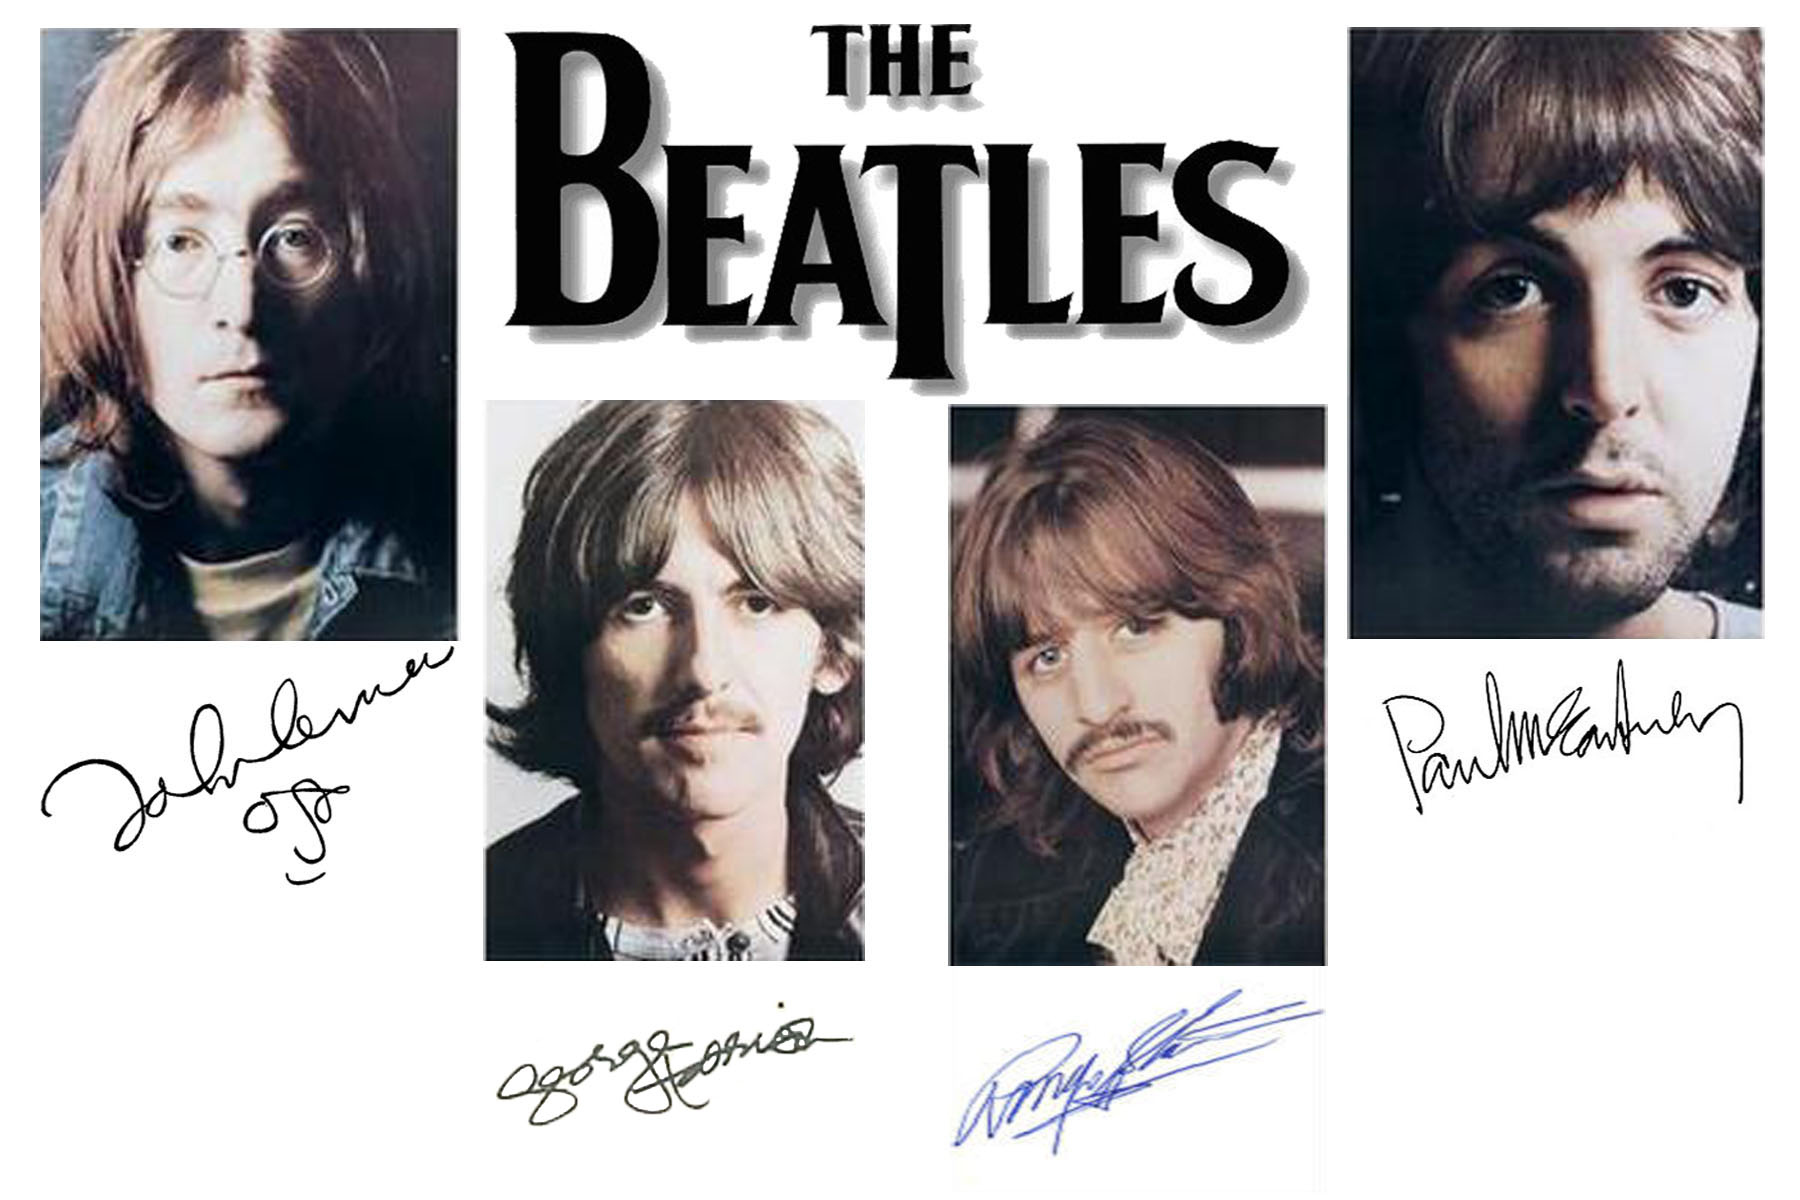 The Beatles Wallpaper By TriceCeilborn